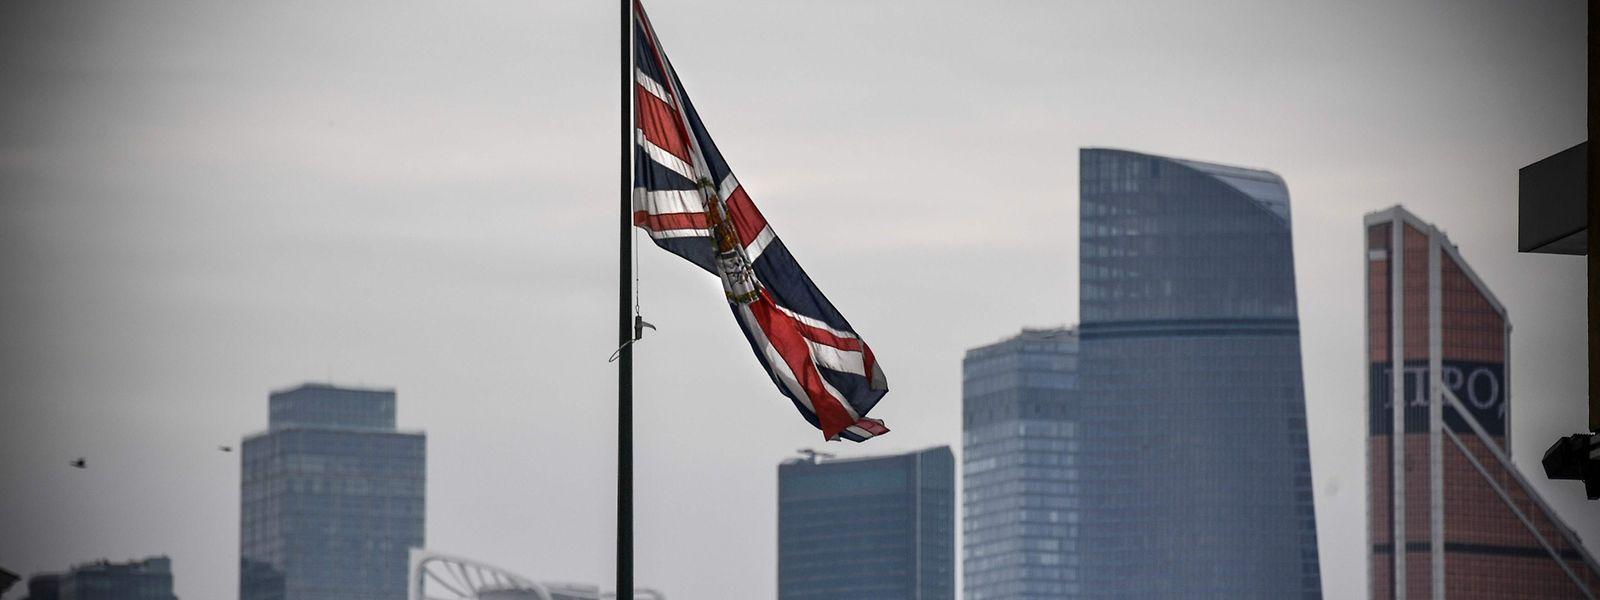 Premierministerin Theresa May kündigte die Sanktion am Mittwoch im Parlament in London an.